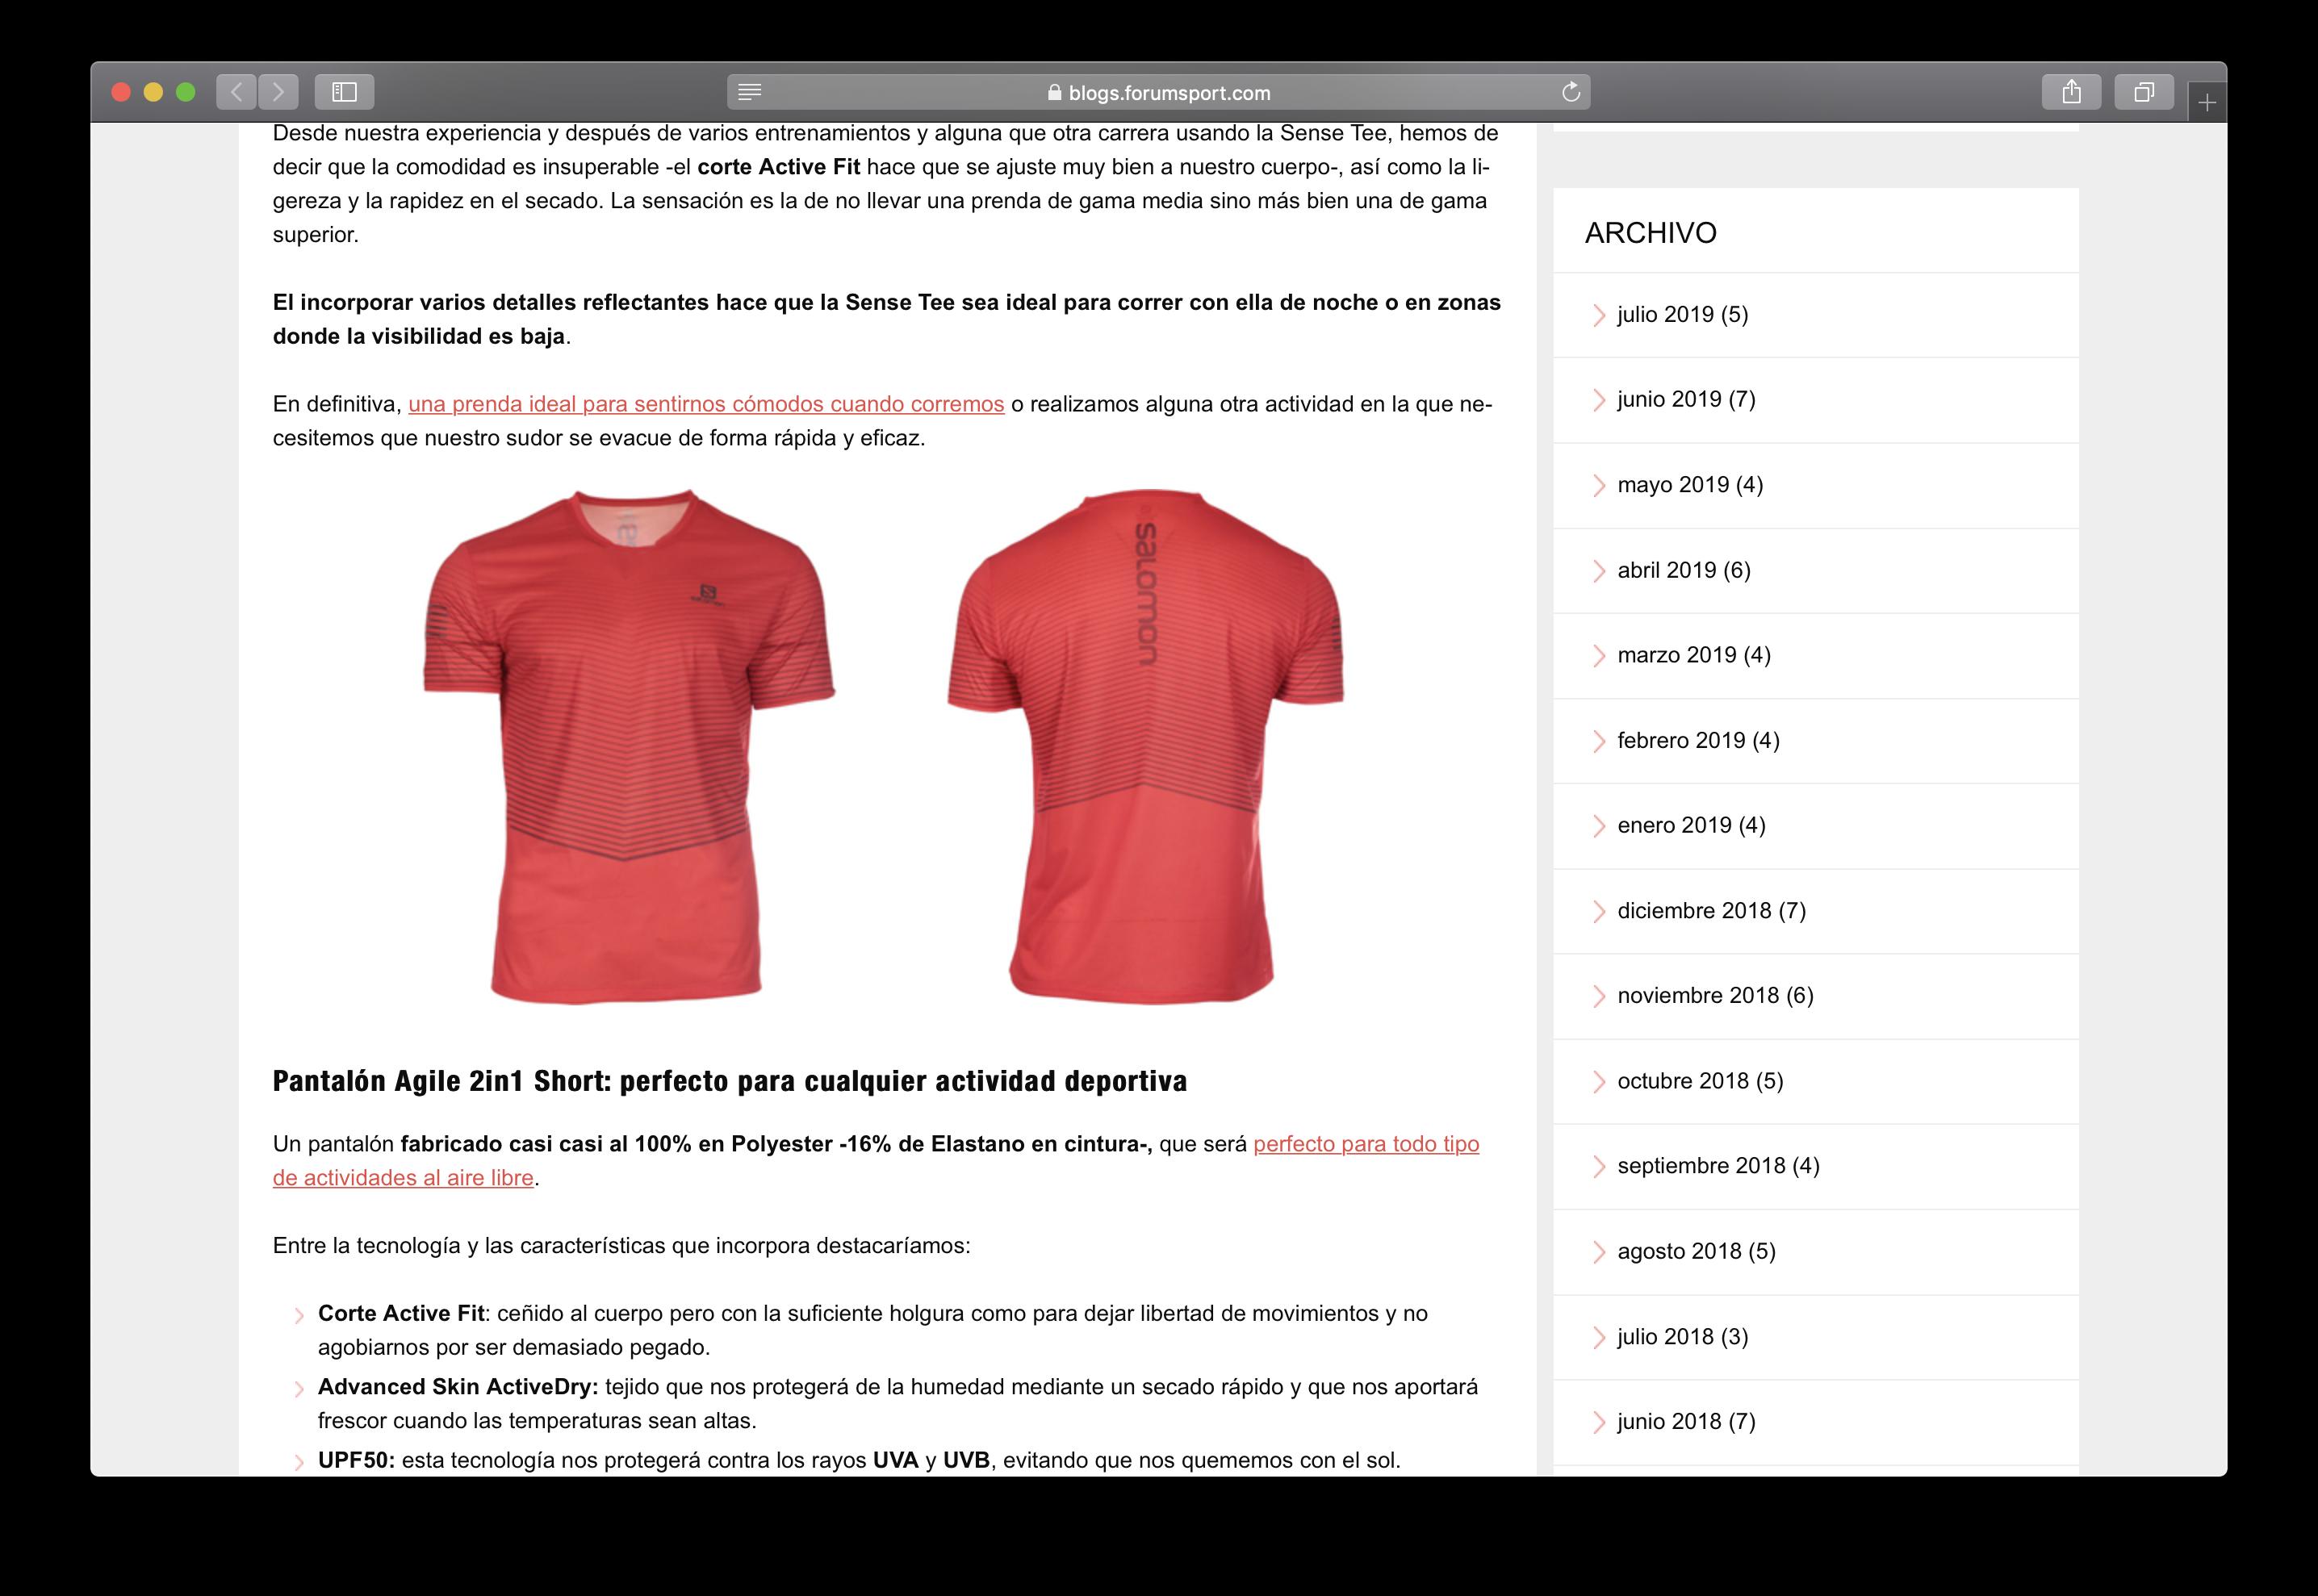 enlazado-interno-blog-ecommerce-categorias-seo-optimizacion-1